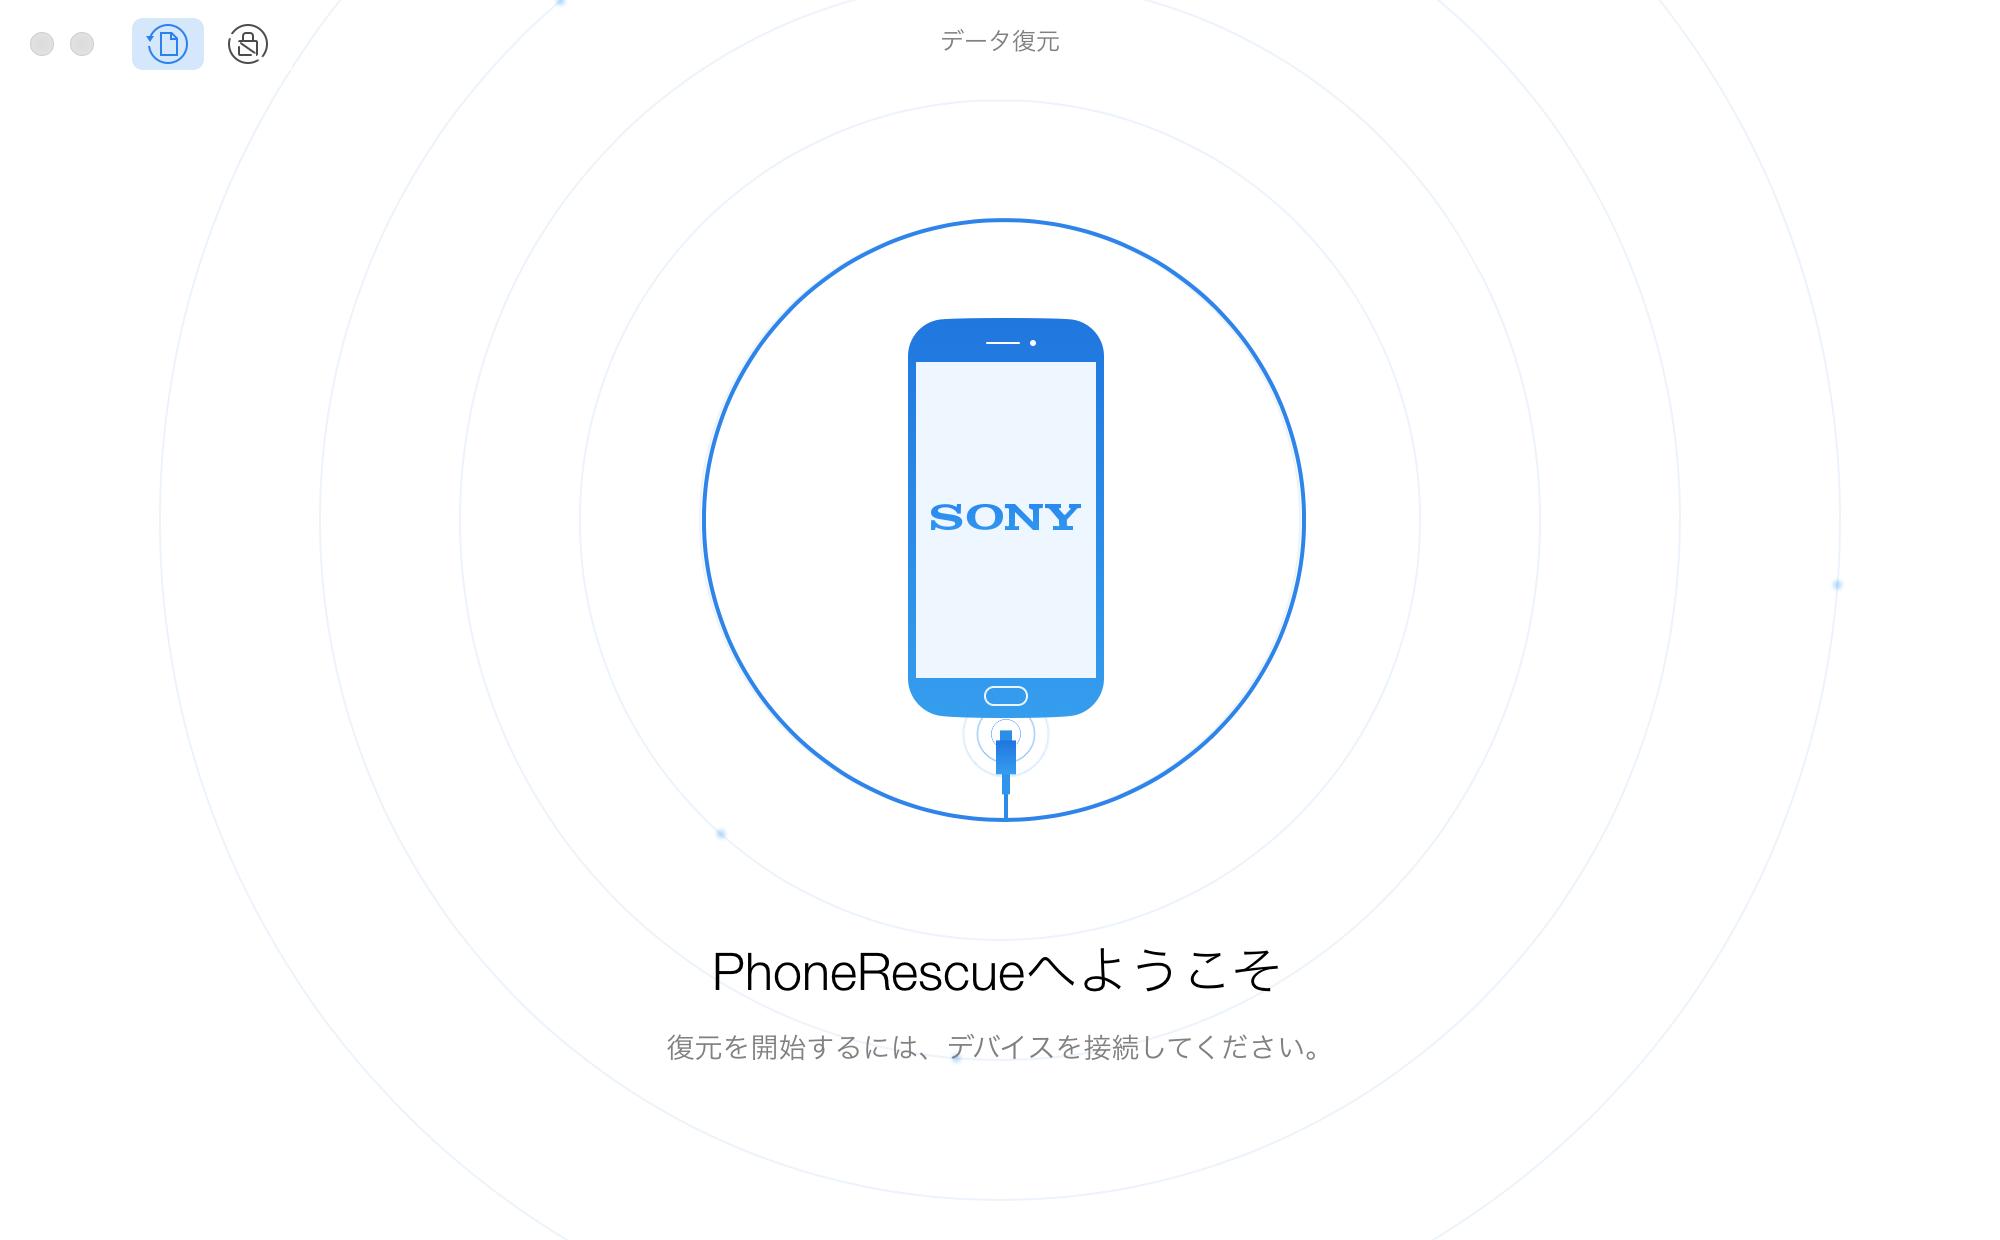 PhoneRescue for Androidのウェルカムページ